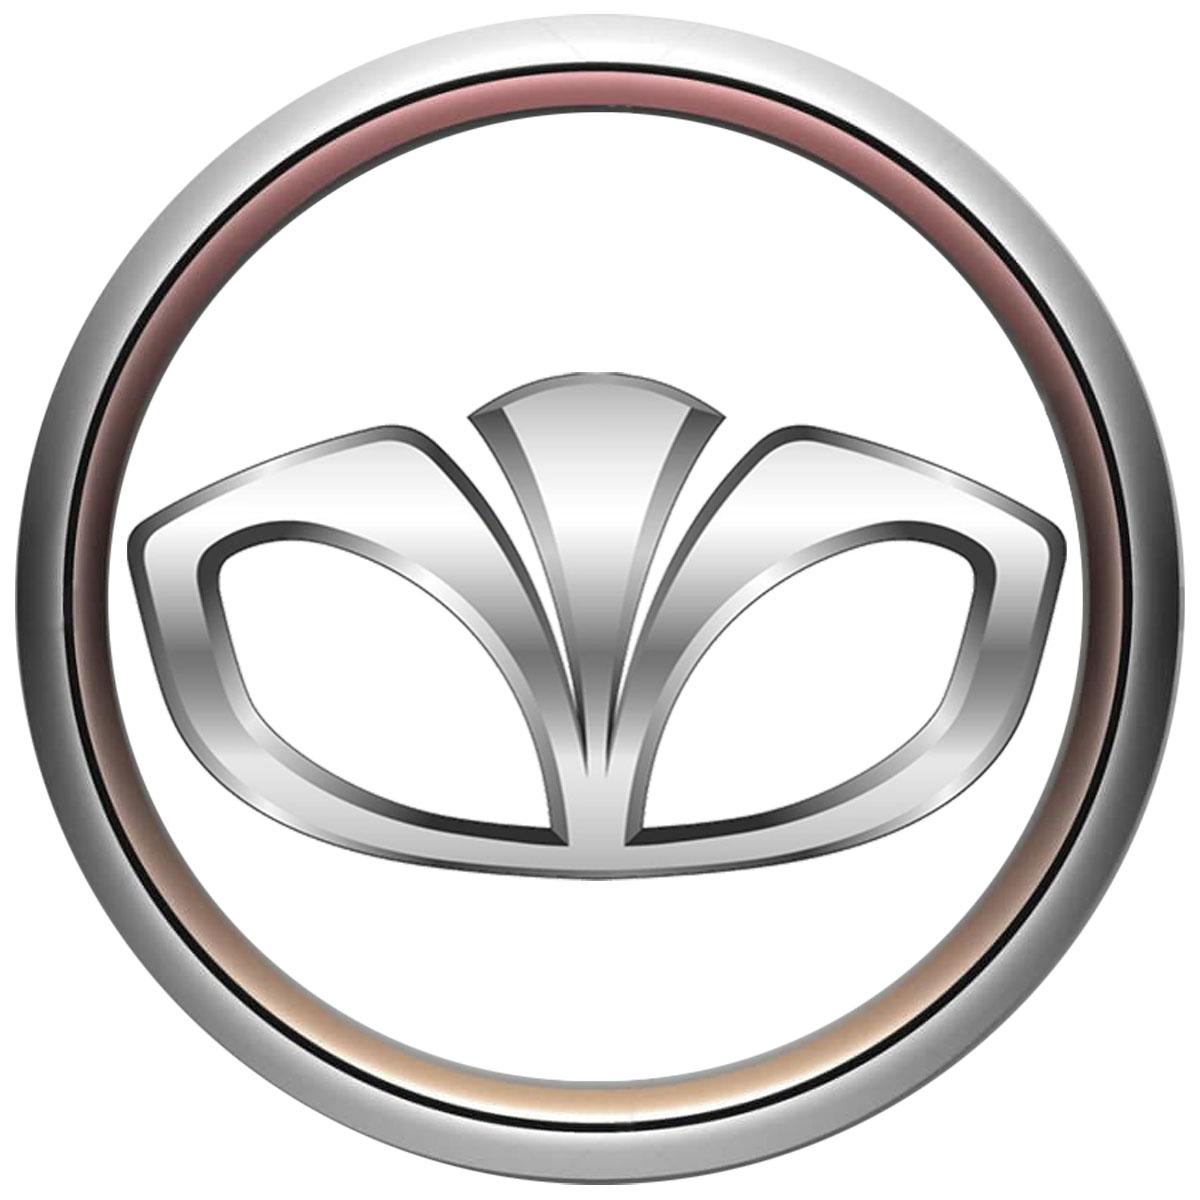 deawoo-logo